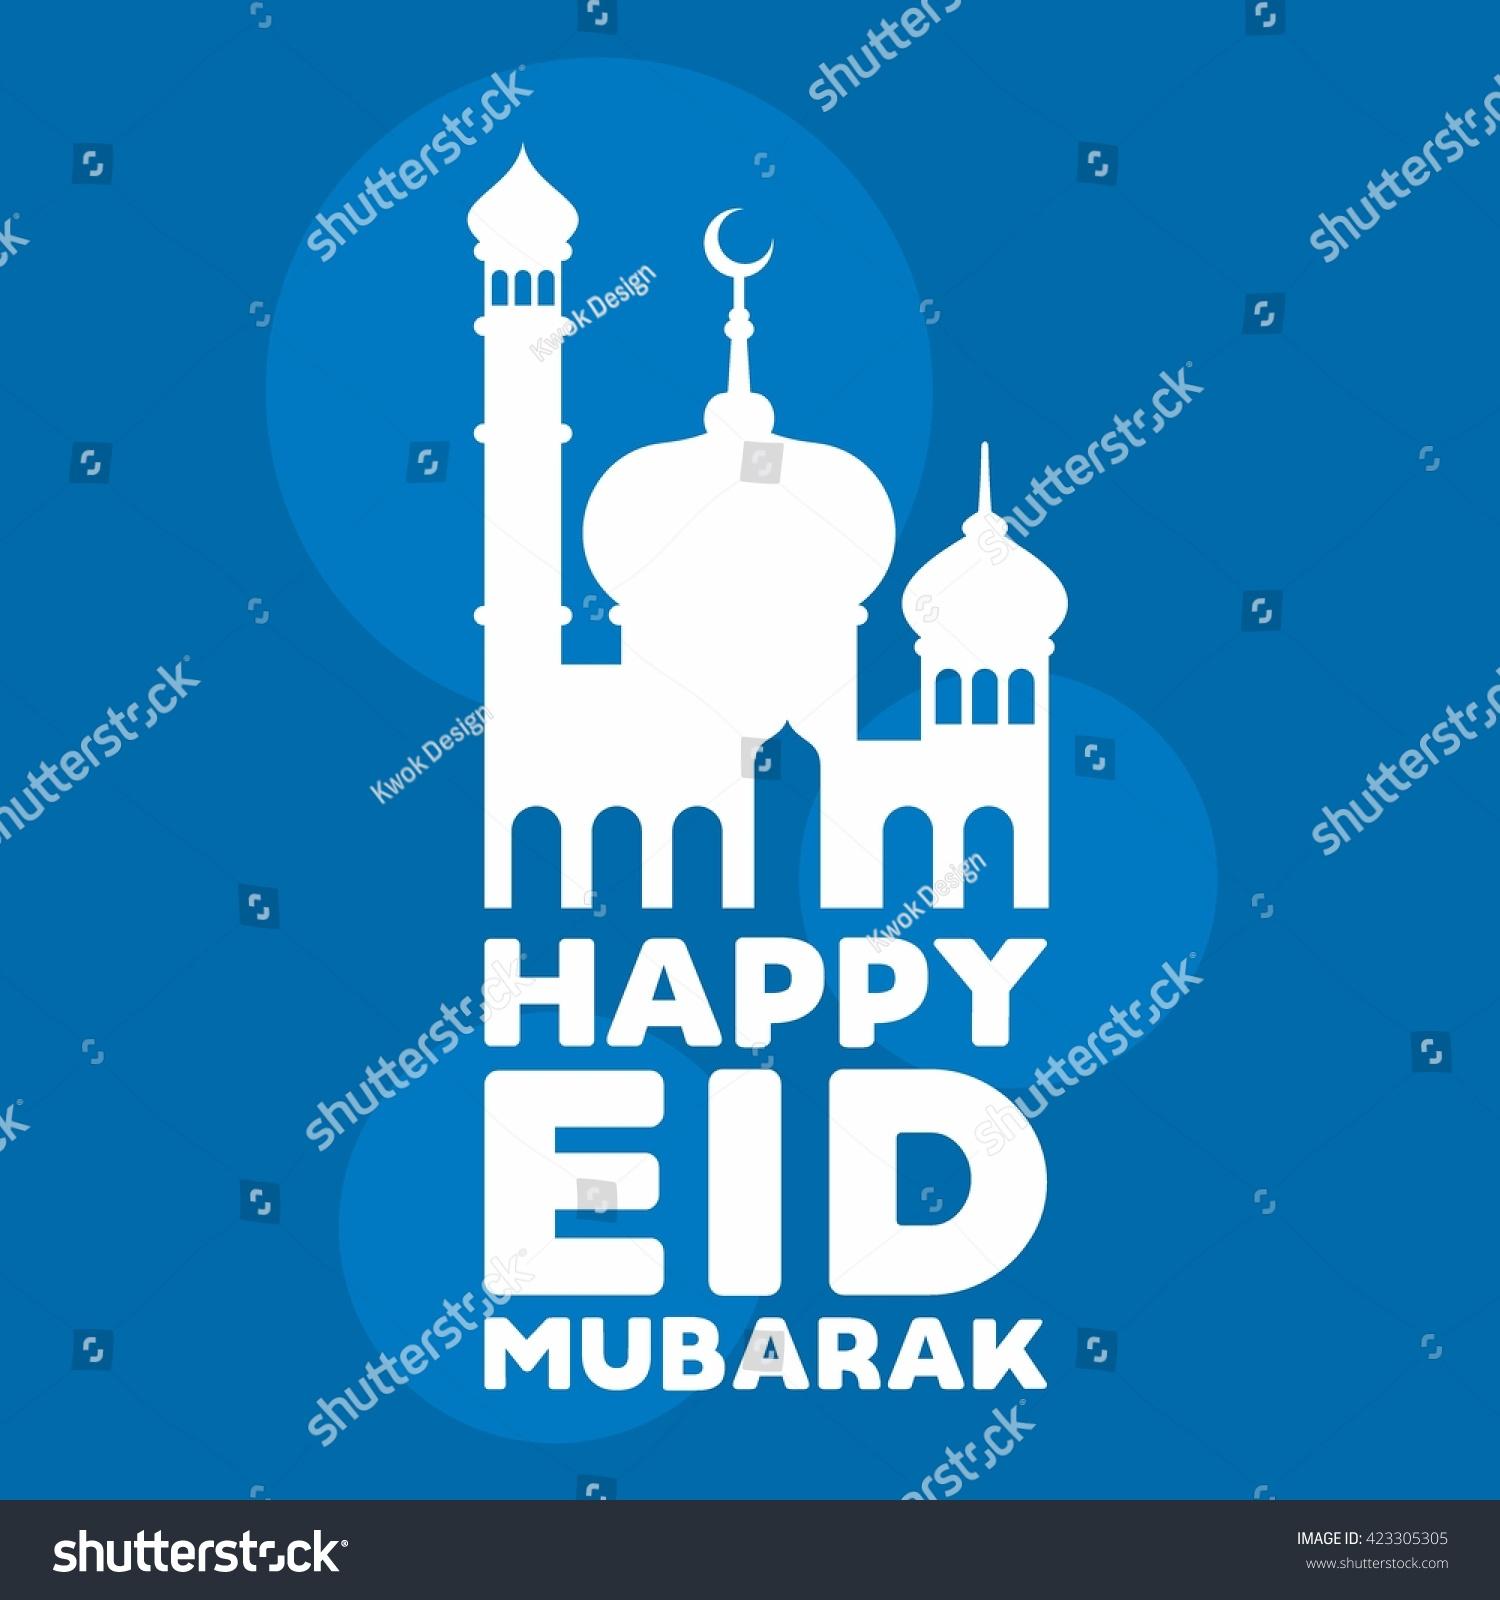 Happy eid mubarak muslim greeting card stock vector royalty free happy eid mubarak muslim greeting card design m4hsunfo